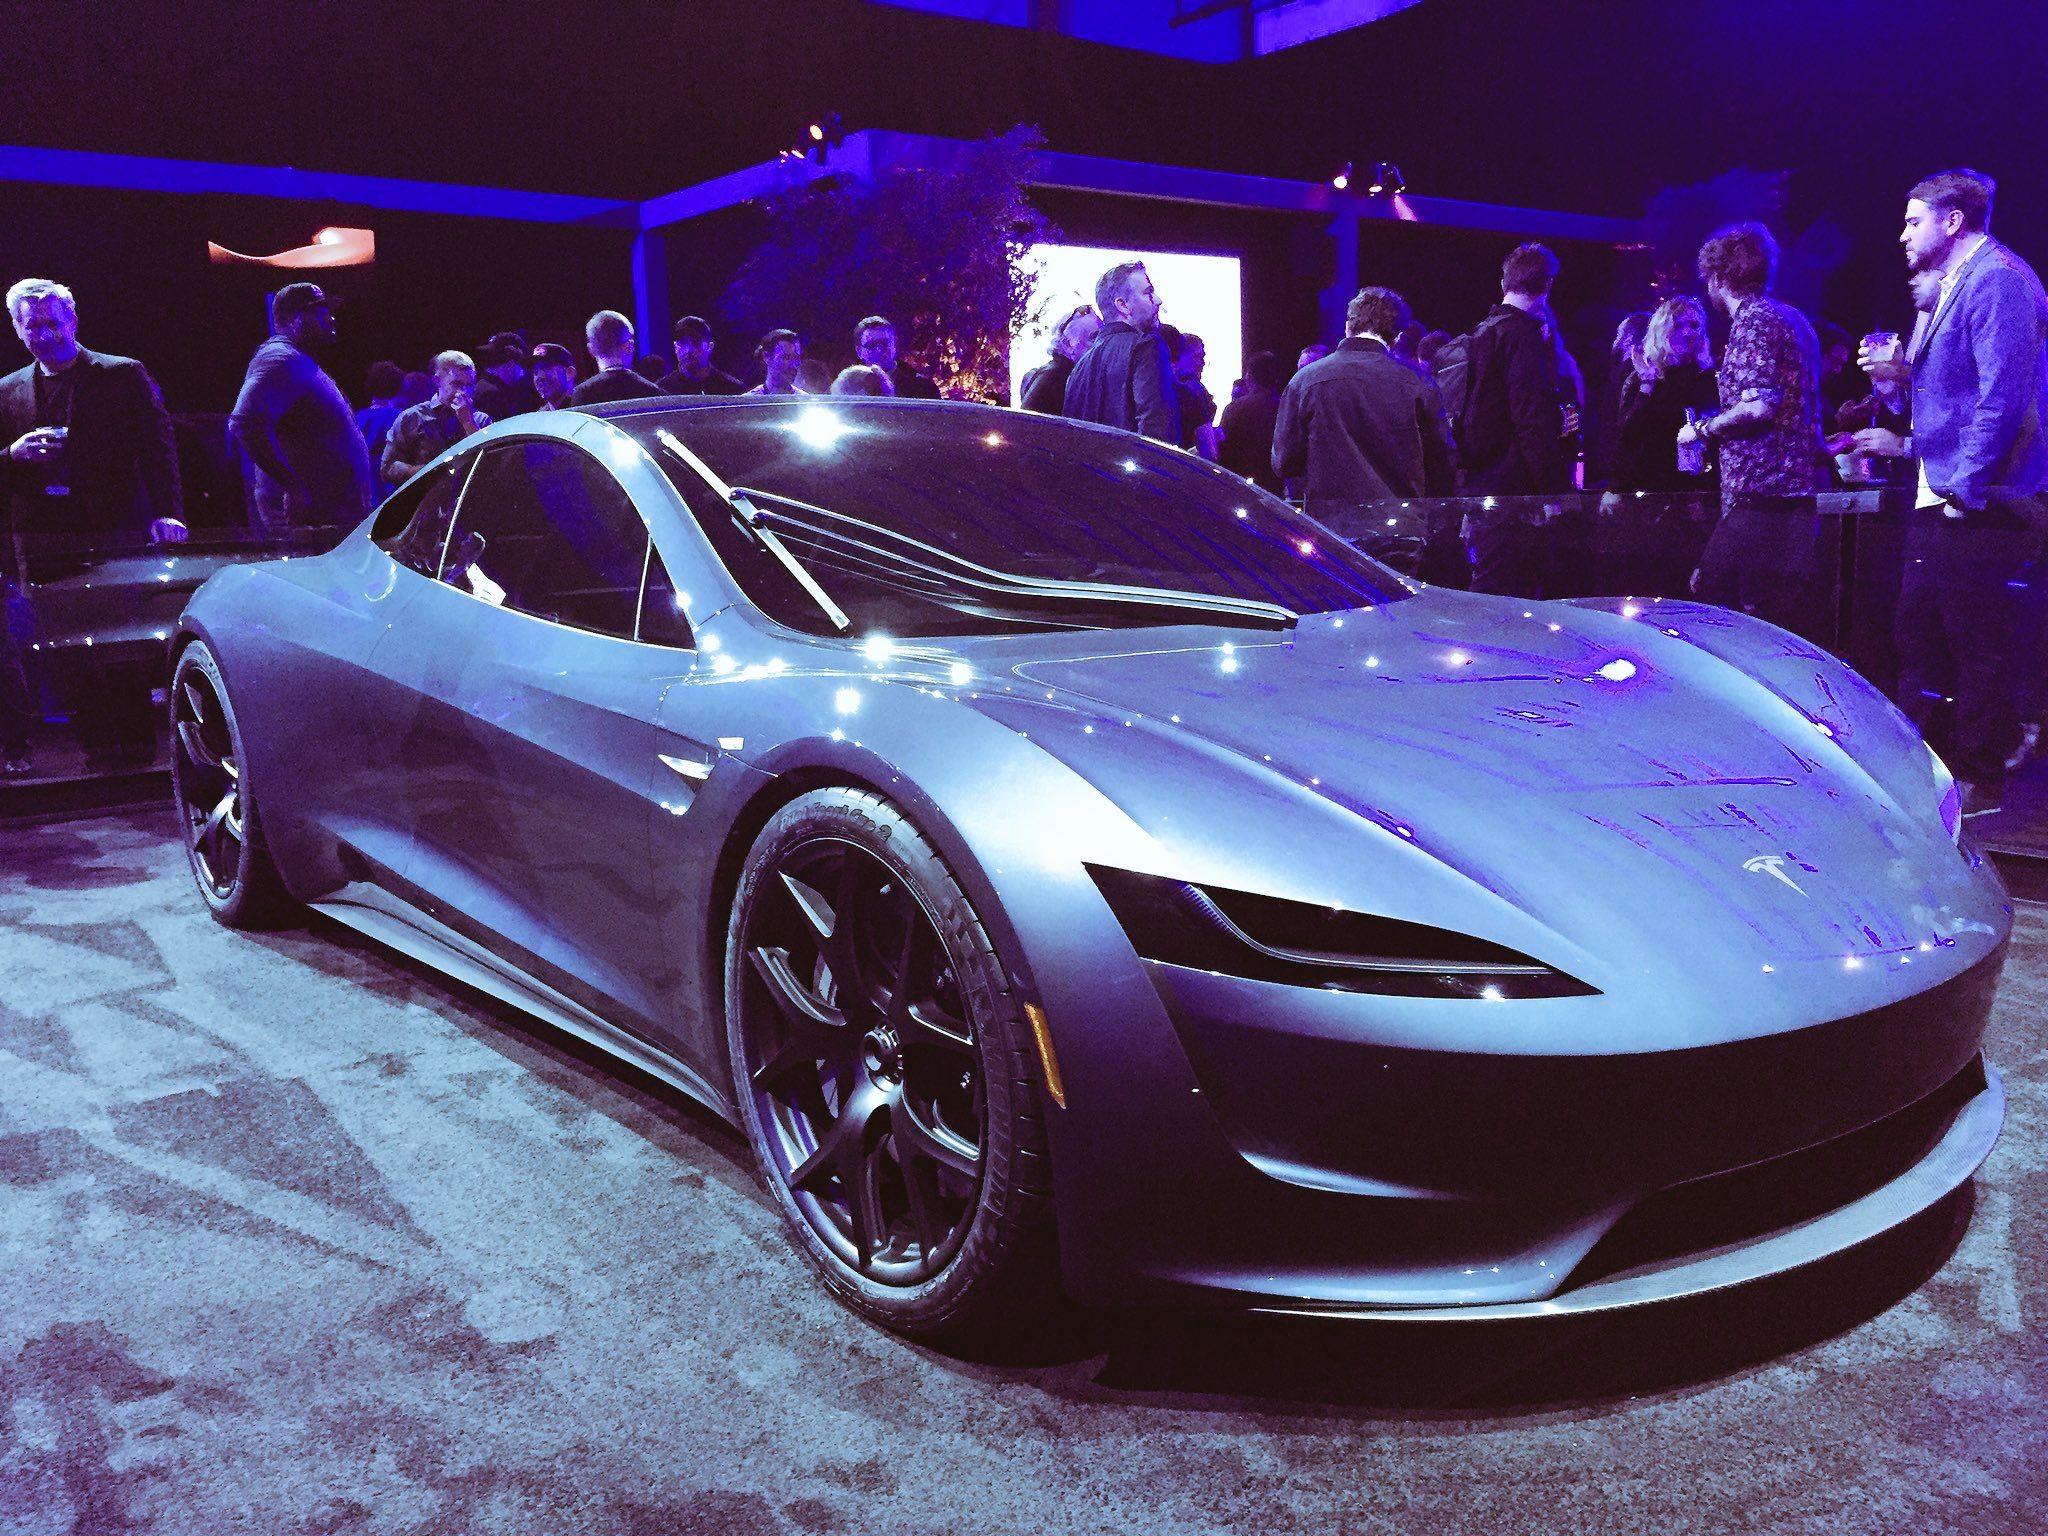 Tesla Sports Car >> Tesla Roadster 2 0 Tesla Roadster Tesla Electric Car